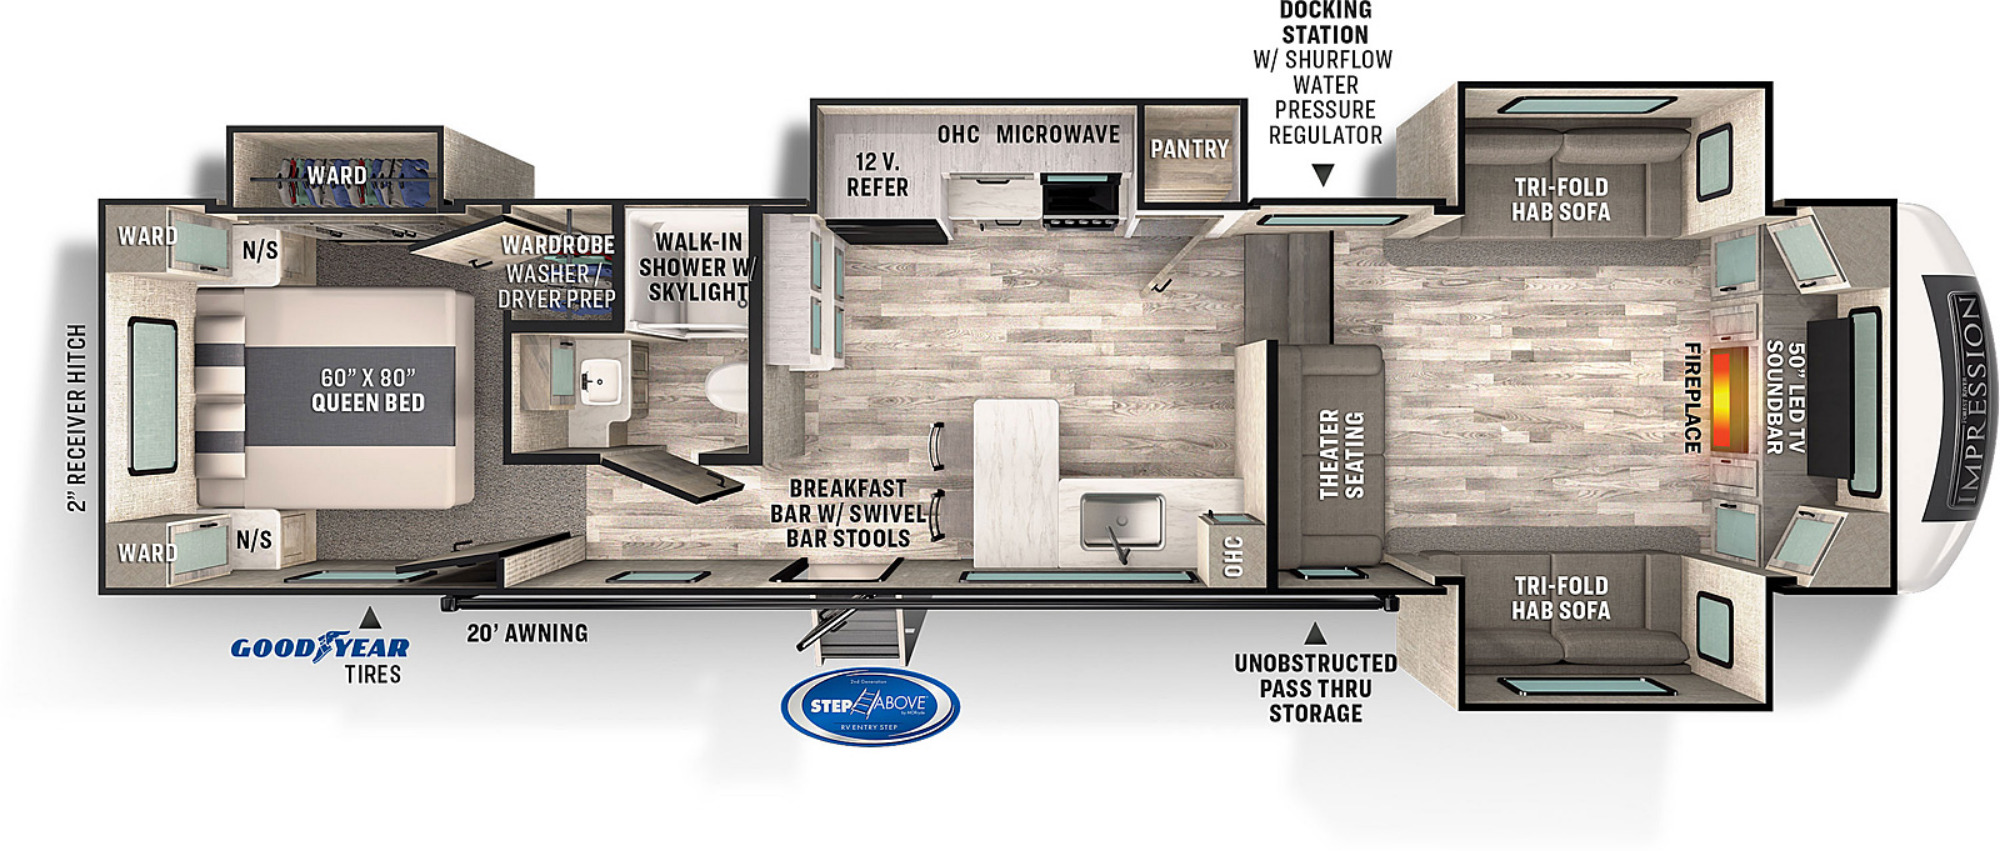 View Floor Plan for 2022 FOREST RIVER IMPRESSION 320FL